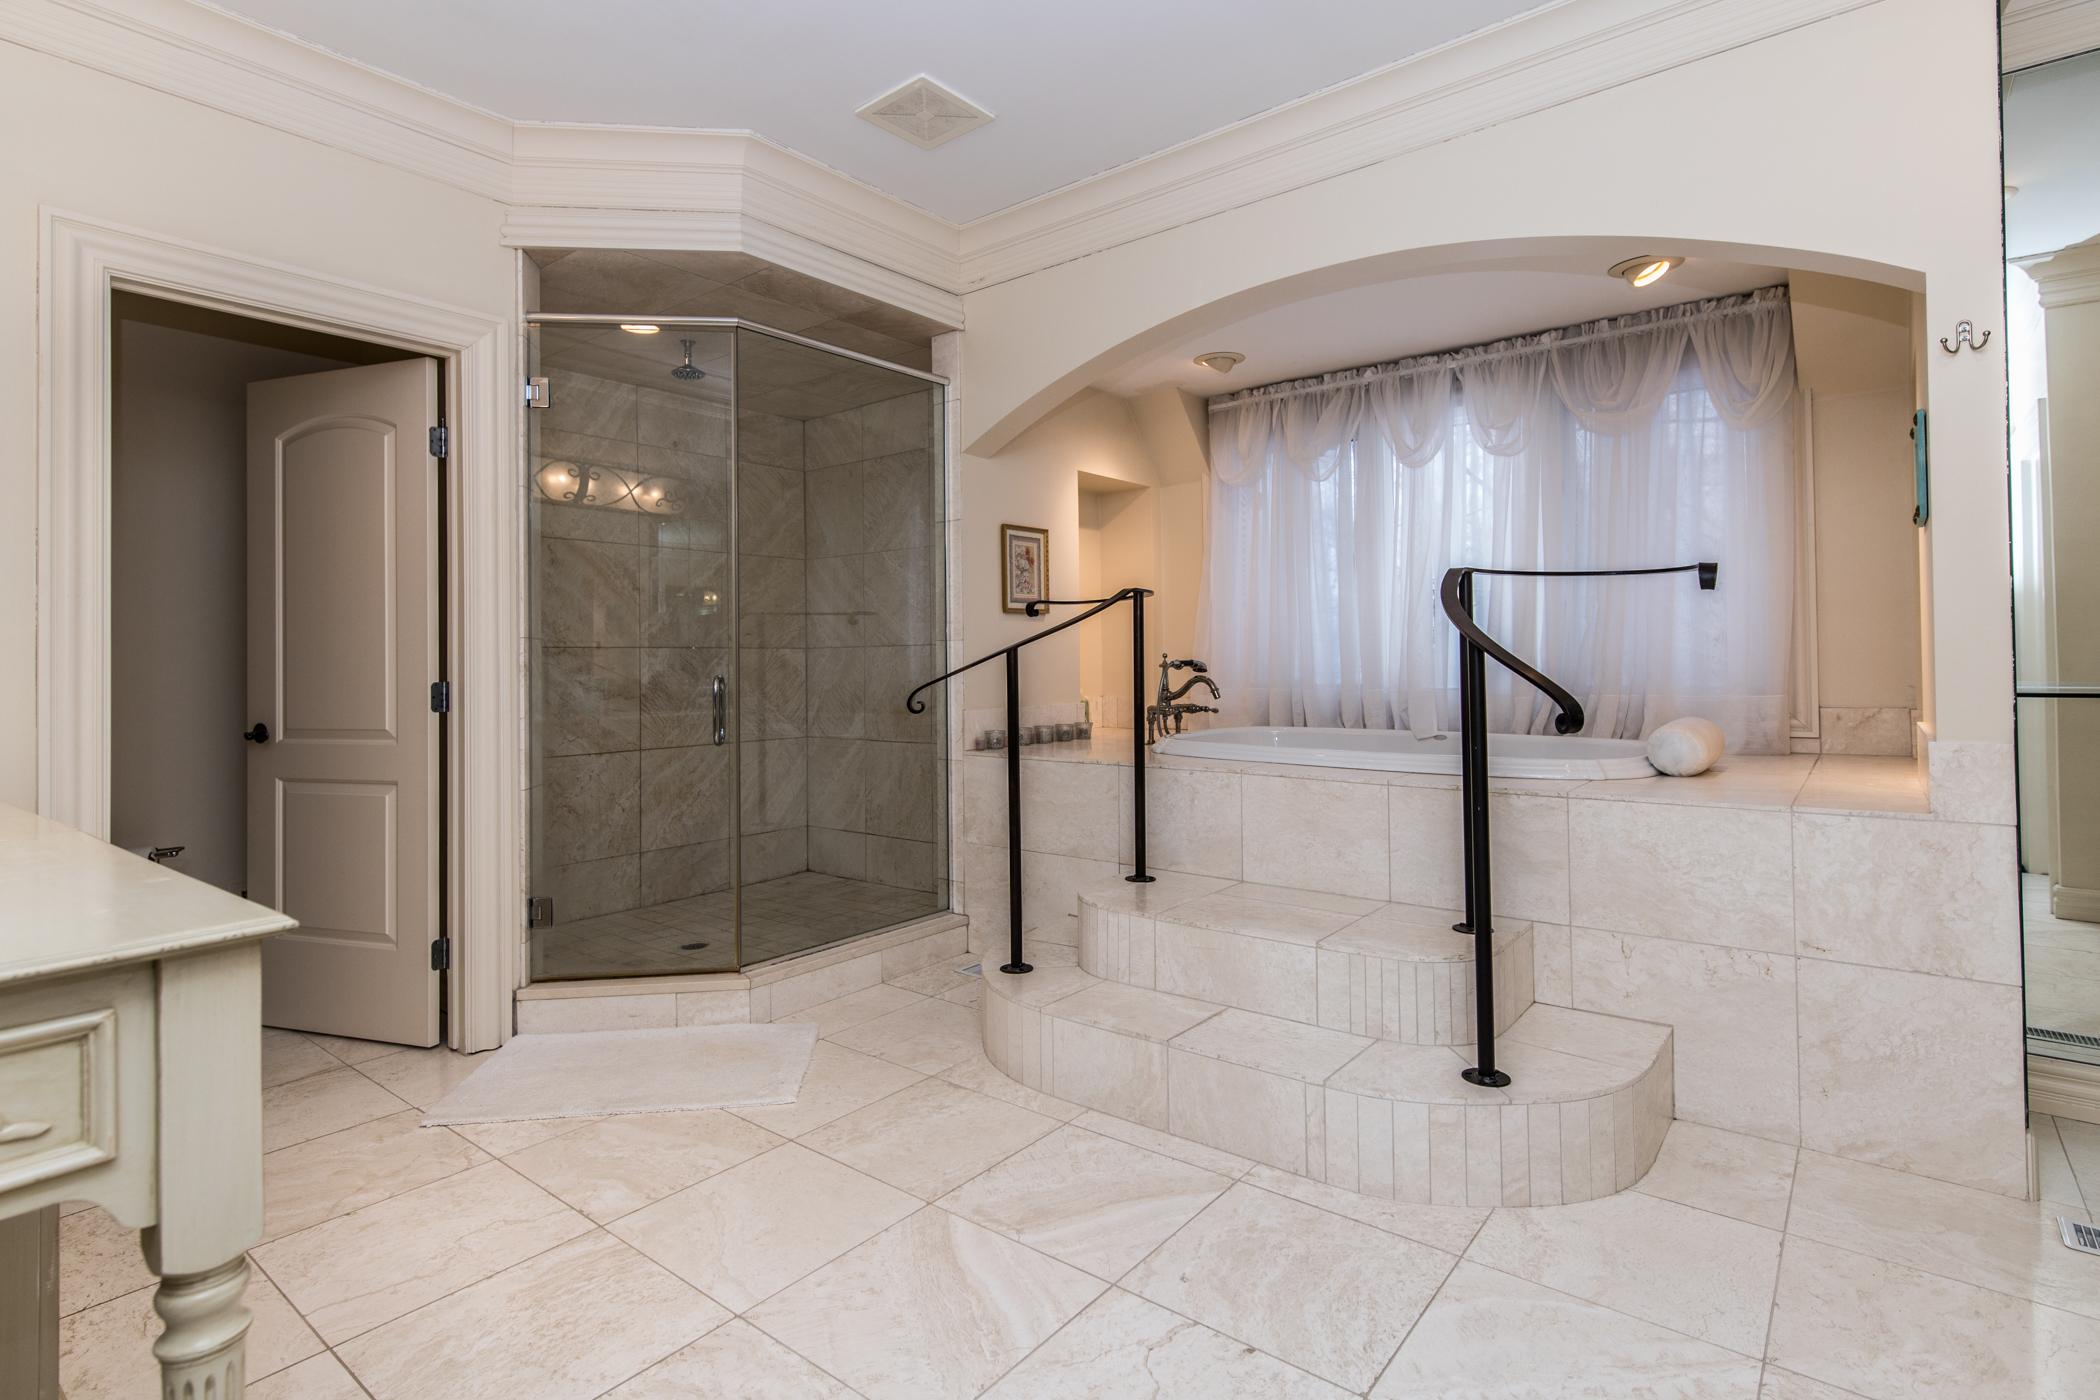 Spa-like glamor master bath